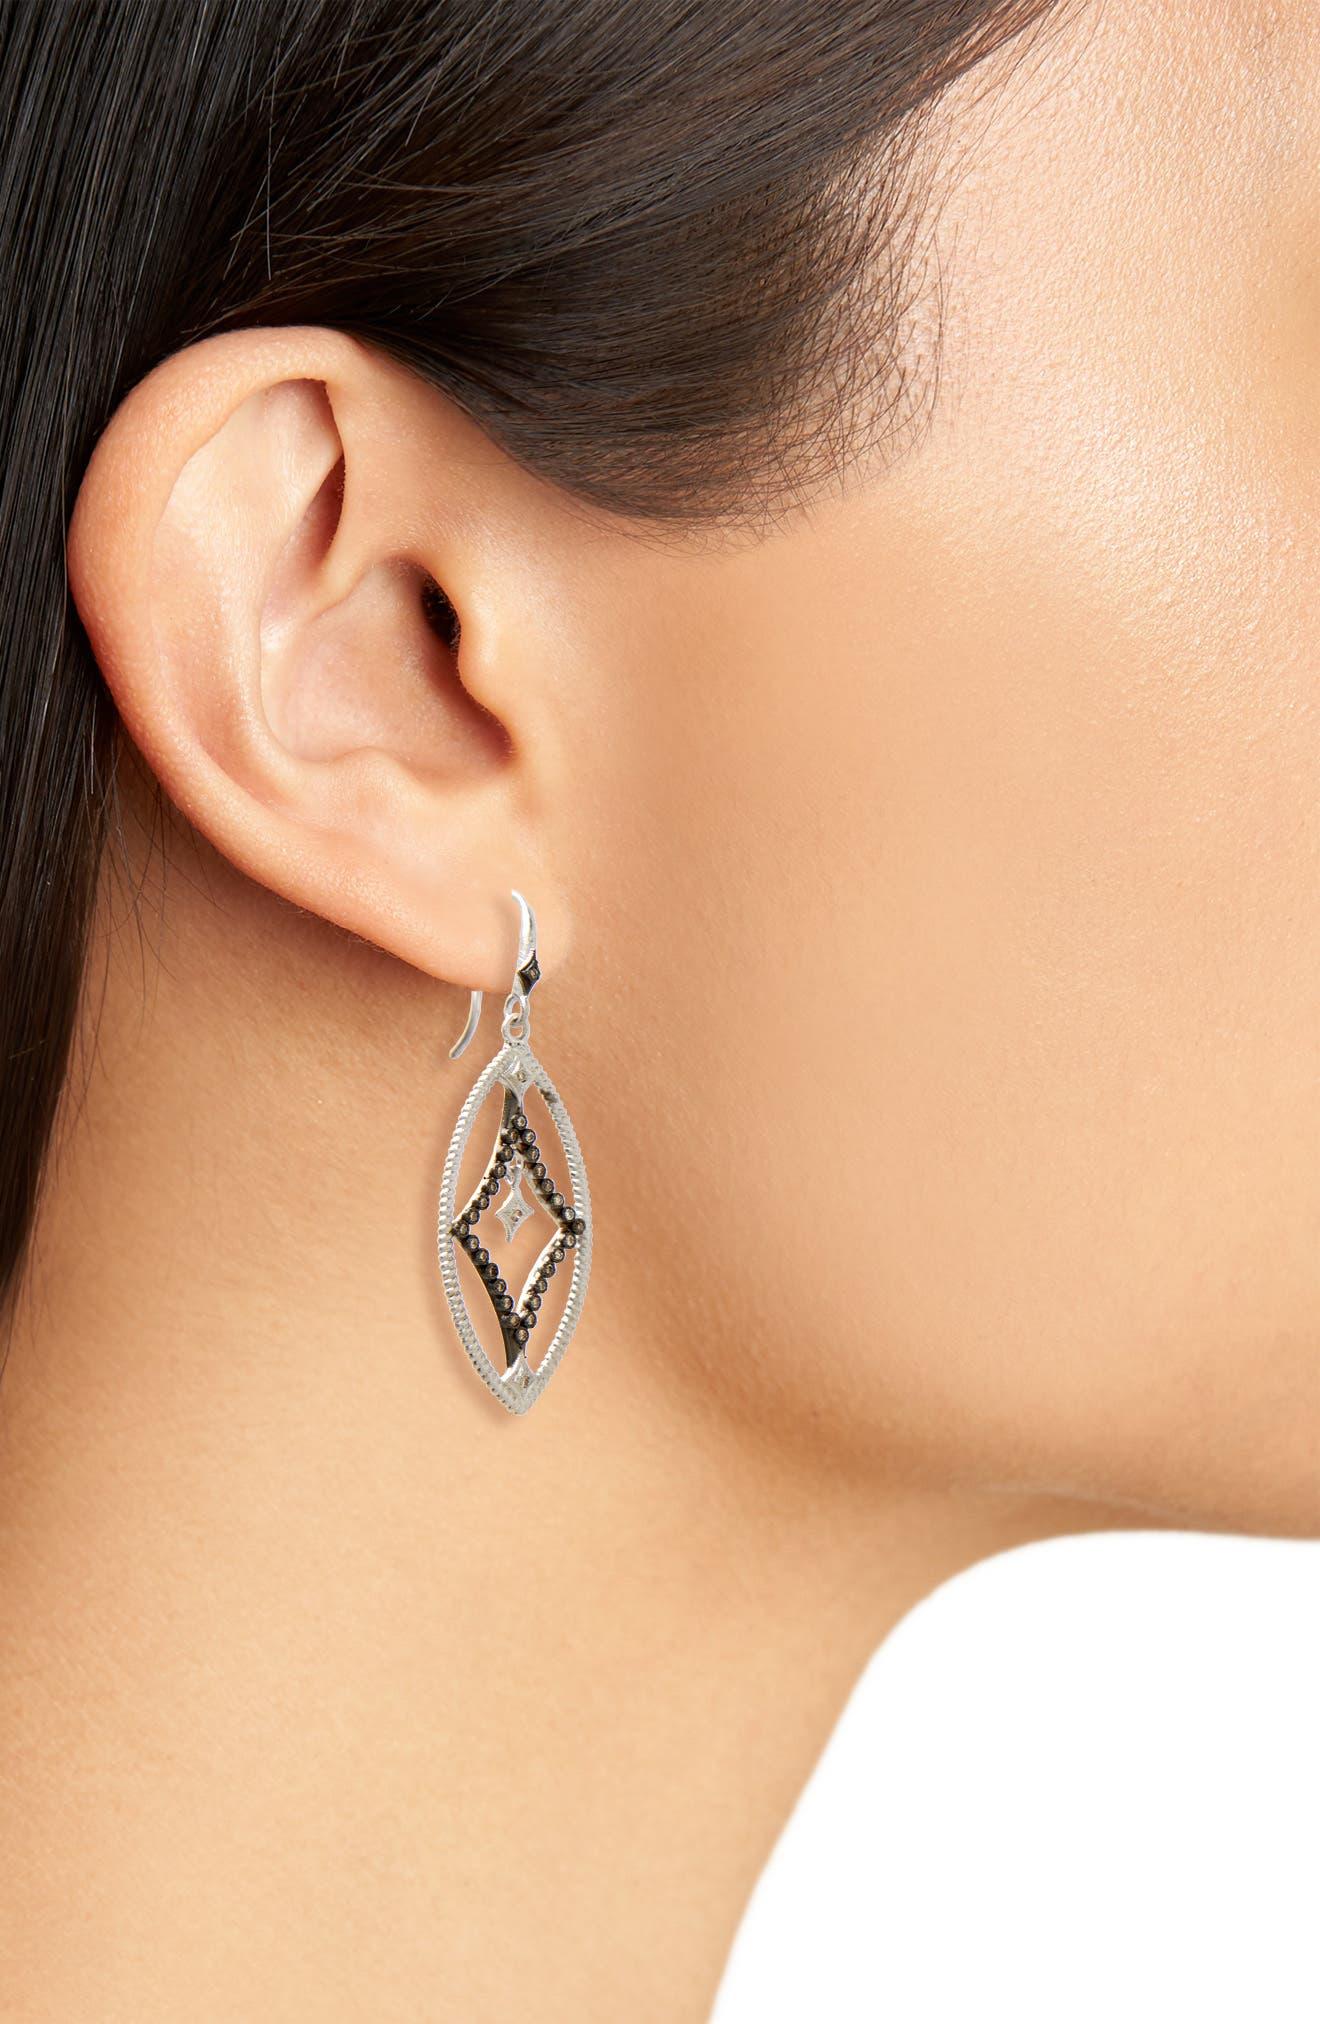 New World Crivelli Drop Earrings,                             Alternate thumbnail 2, color,                             Silver